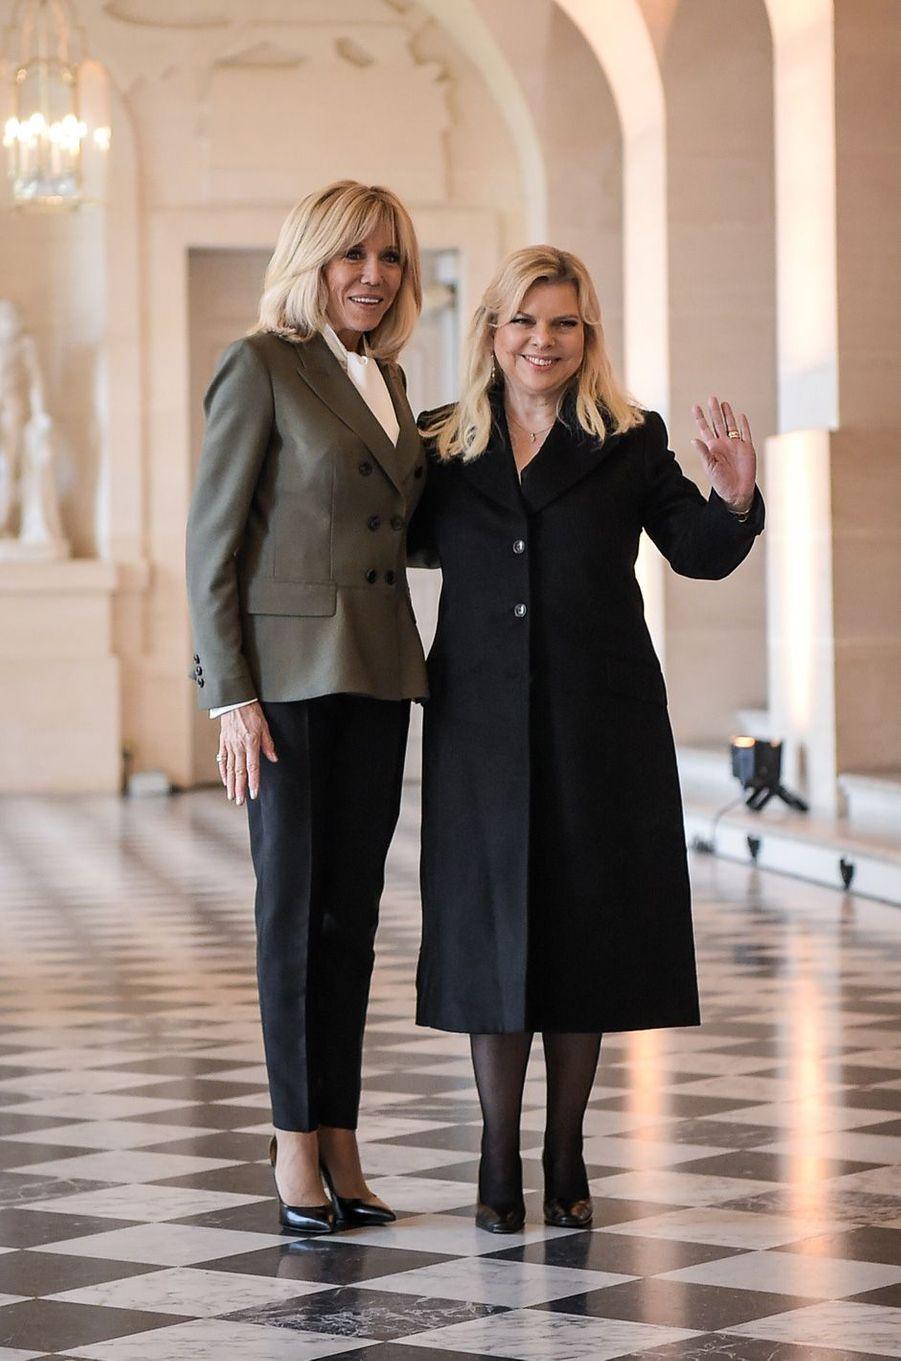 AvecSara Netanyahu, épouse du Premier ministre israélien Benjamin Netanyahu.